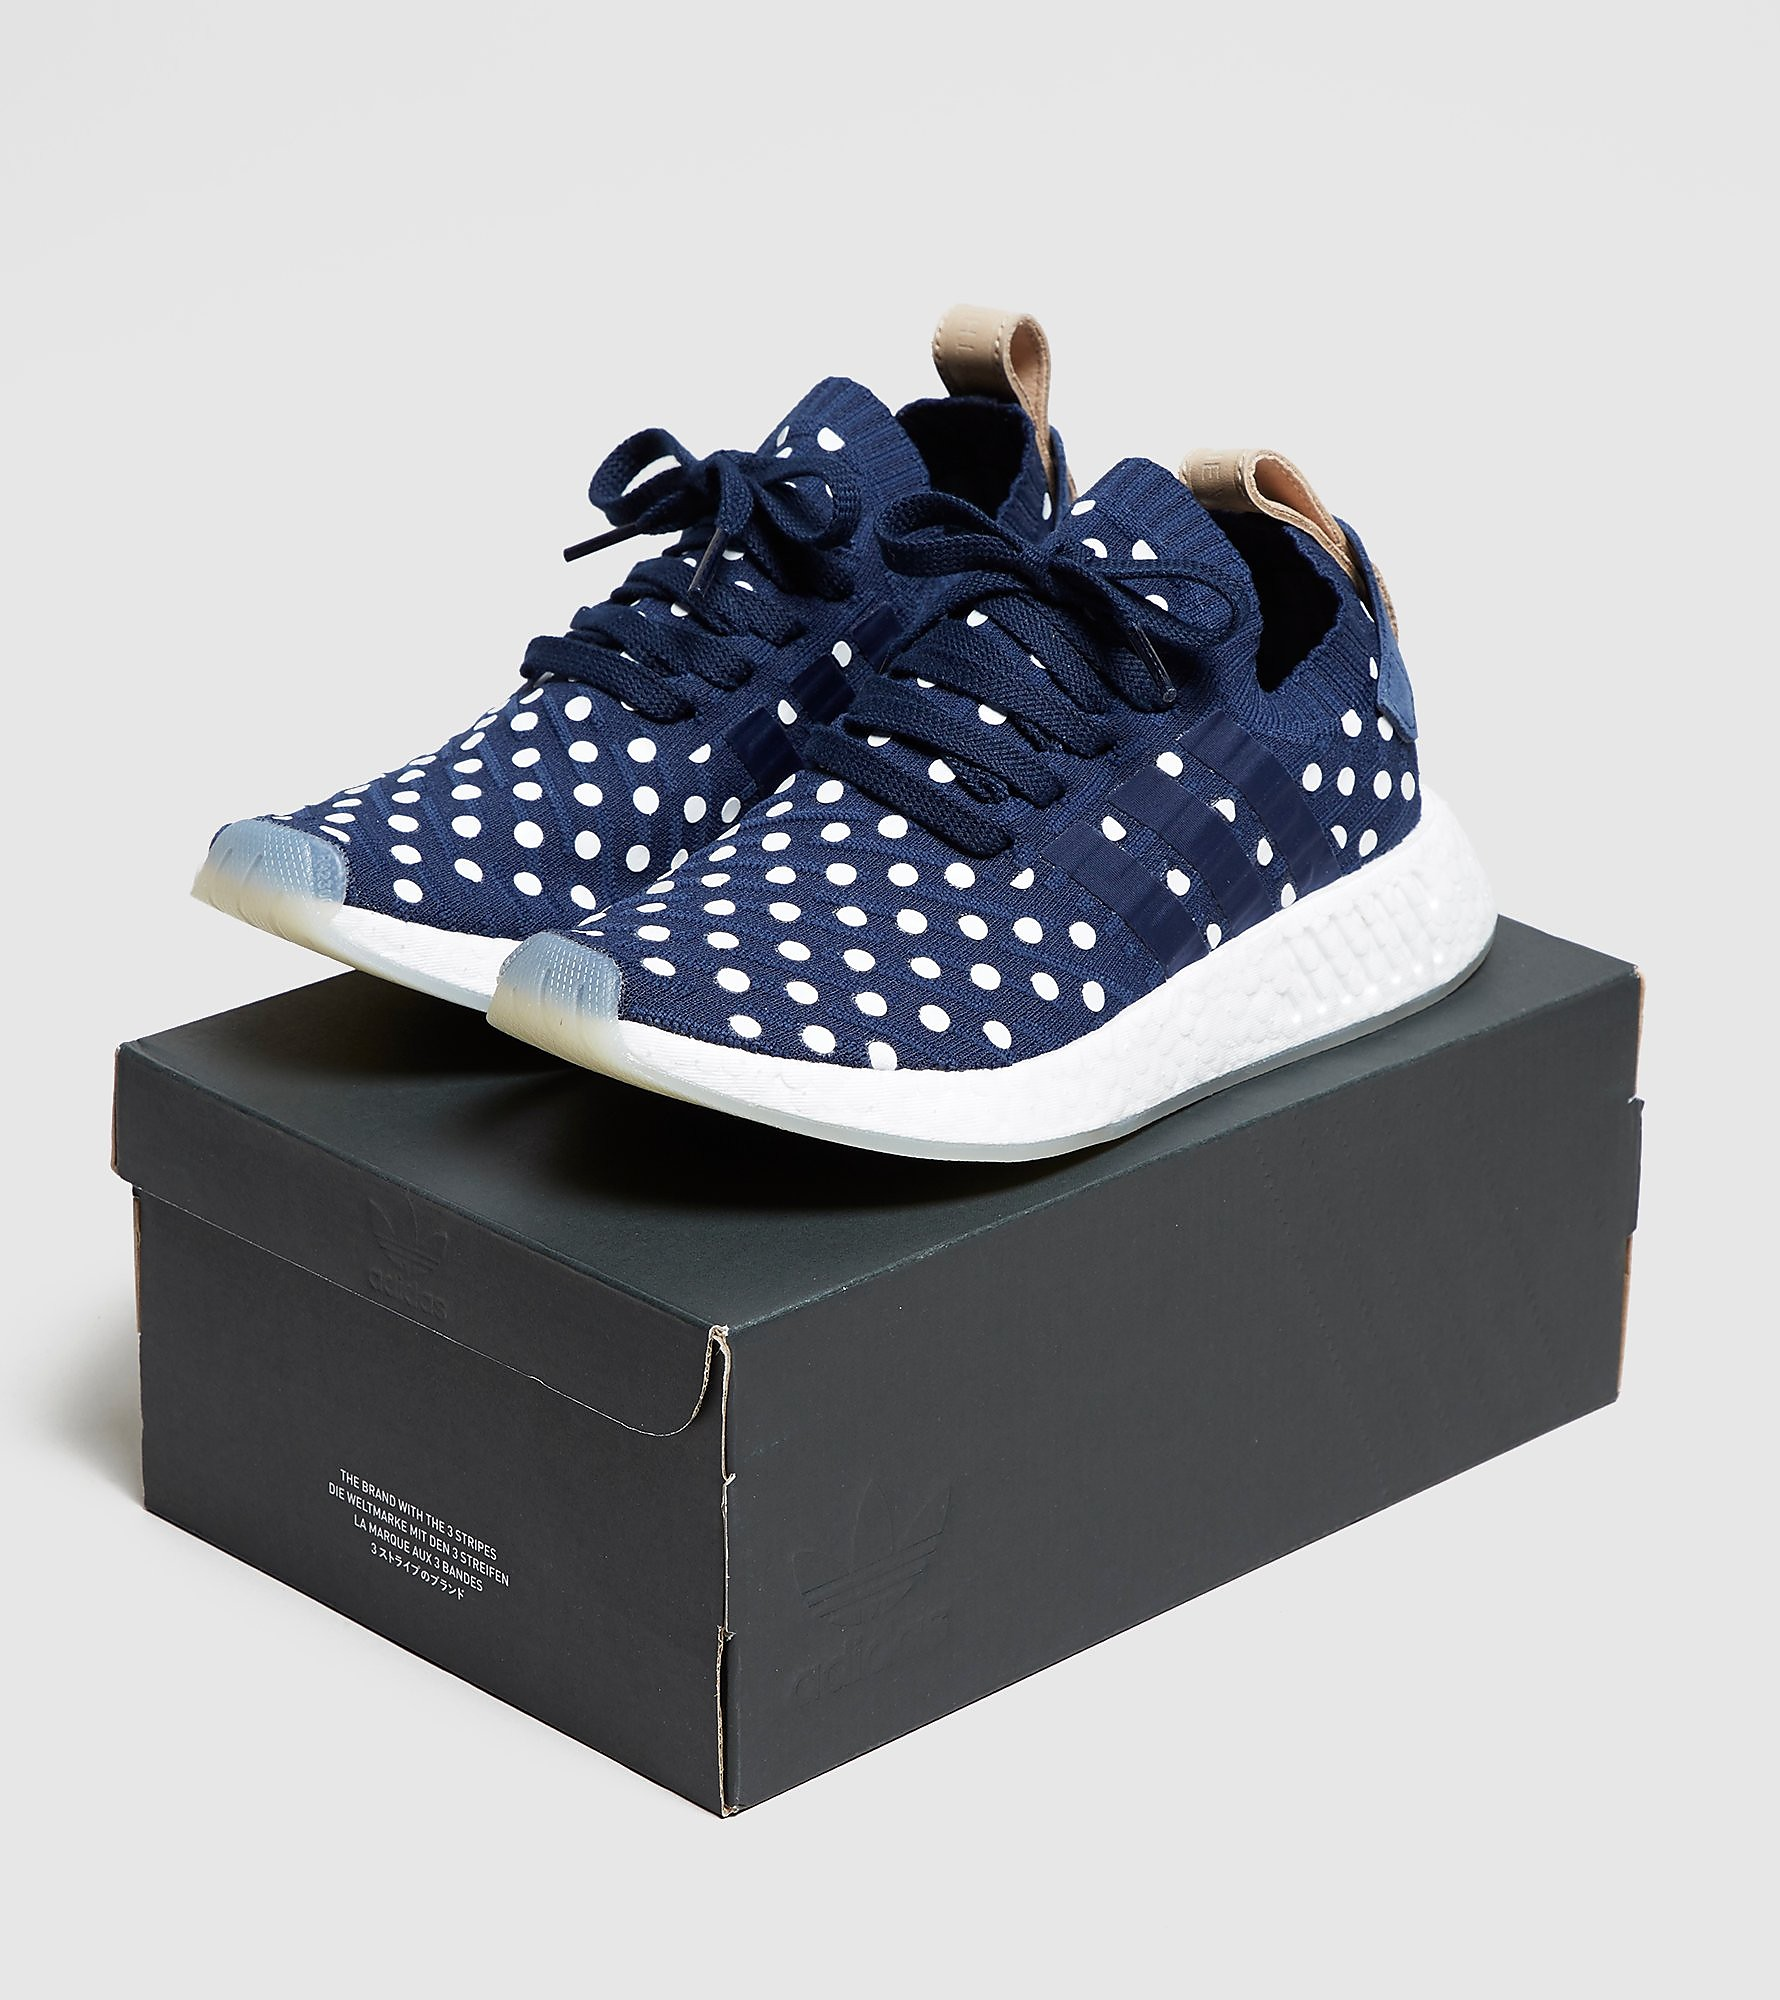 adidas NMD R2 Primeknit Women's